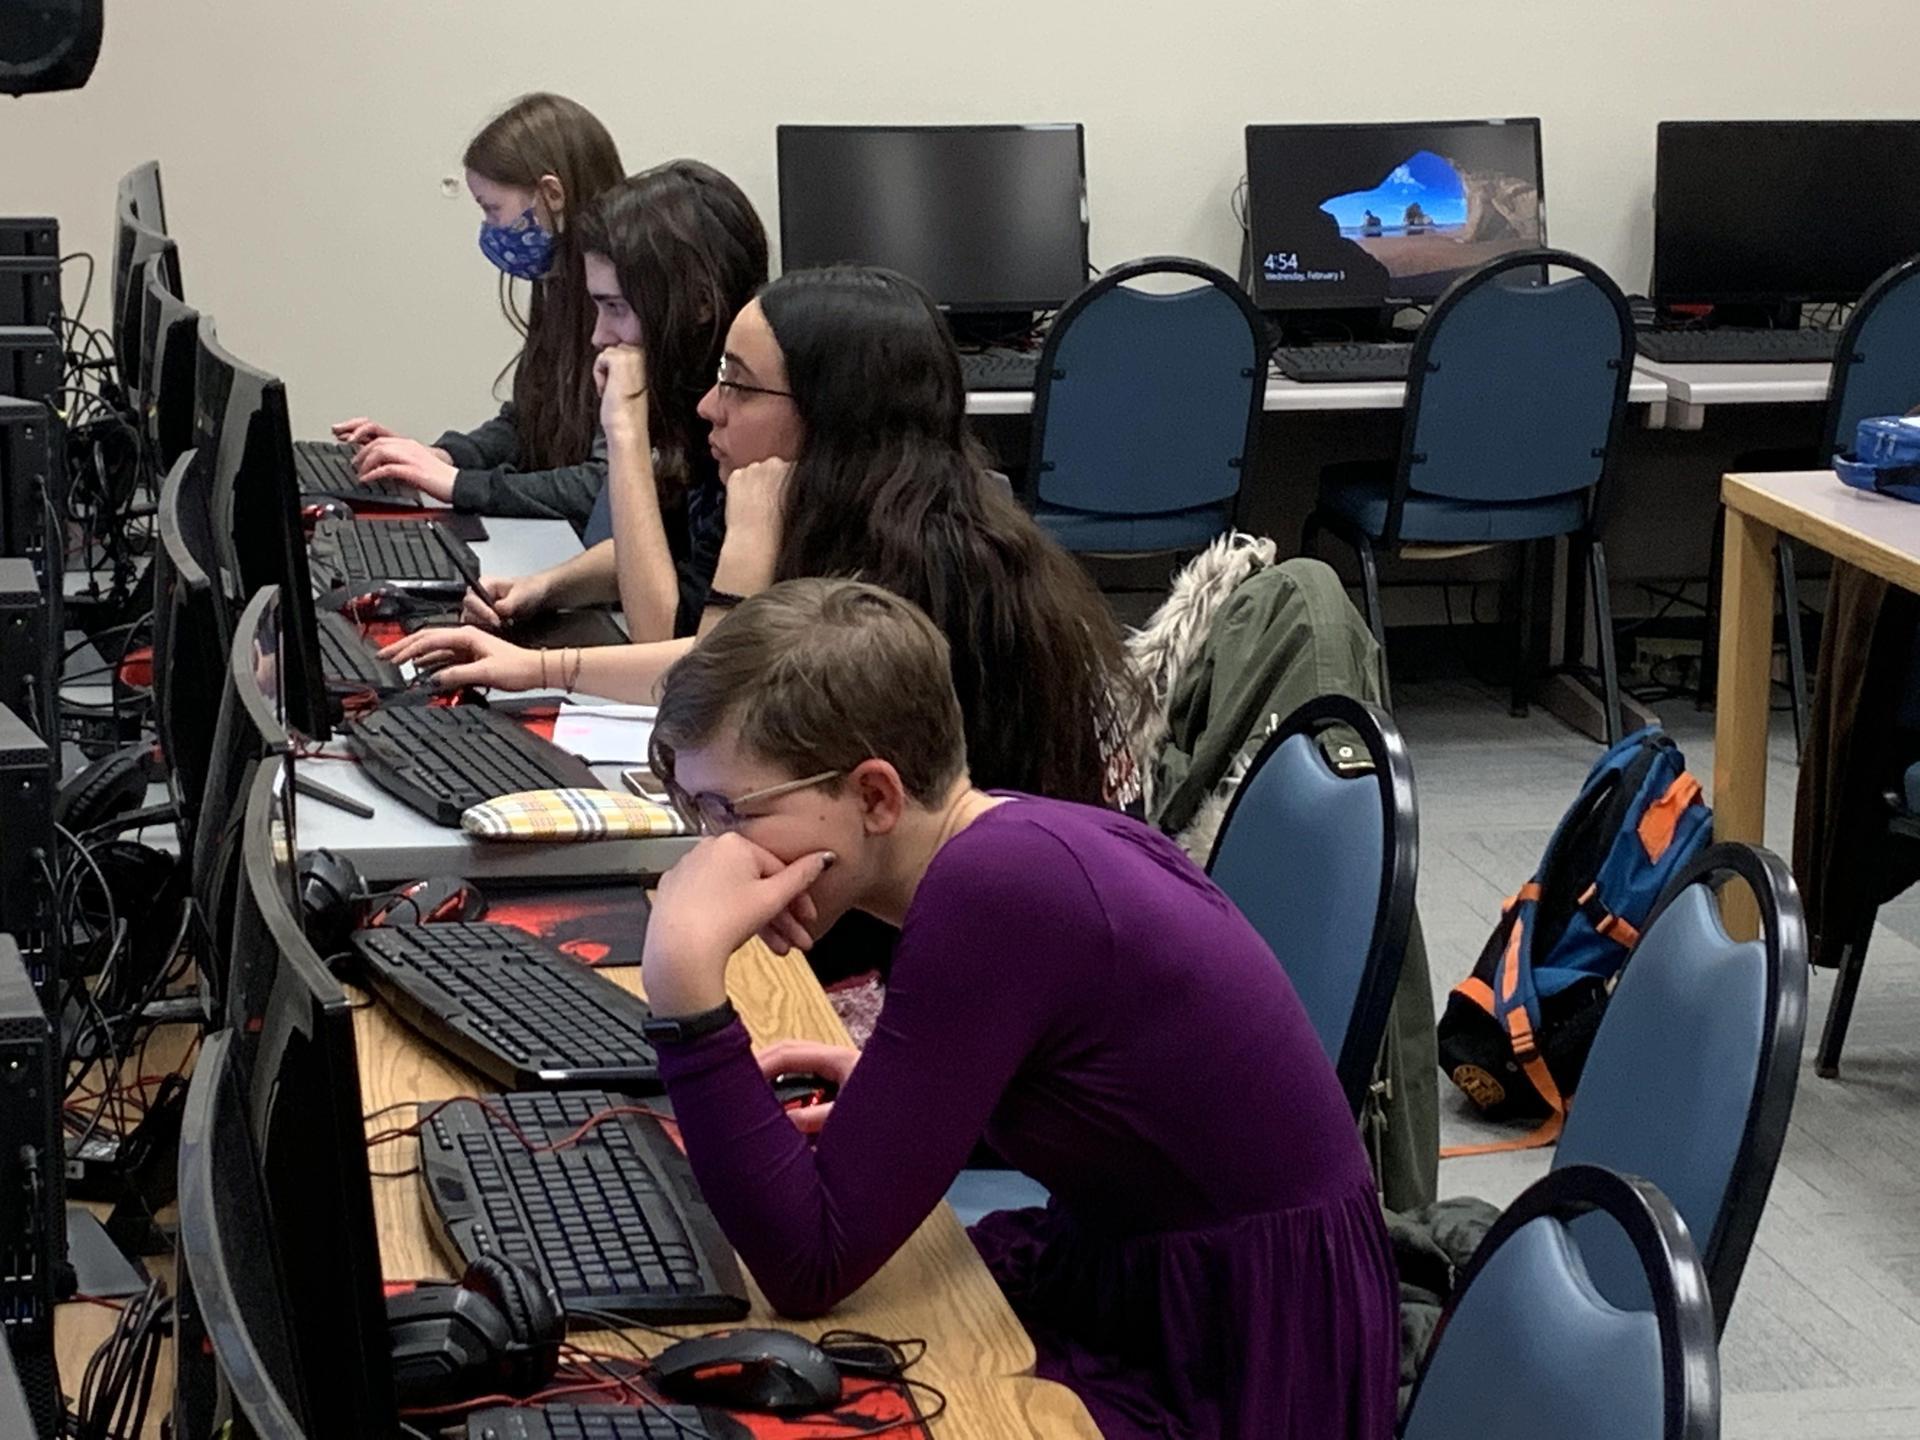 Qubit Queens - Dragons Who Code - CyberStart America